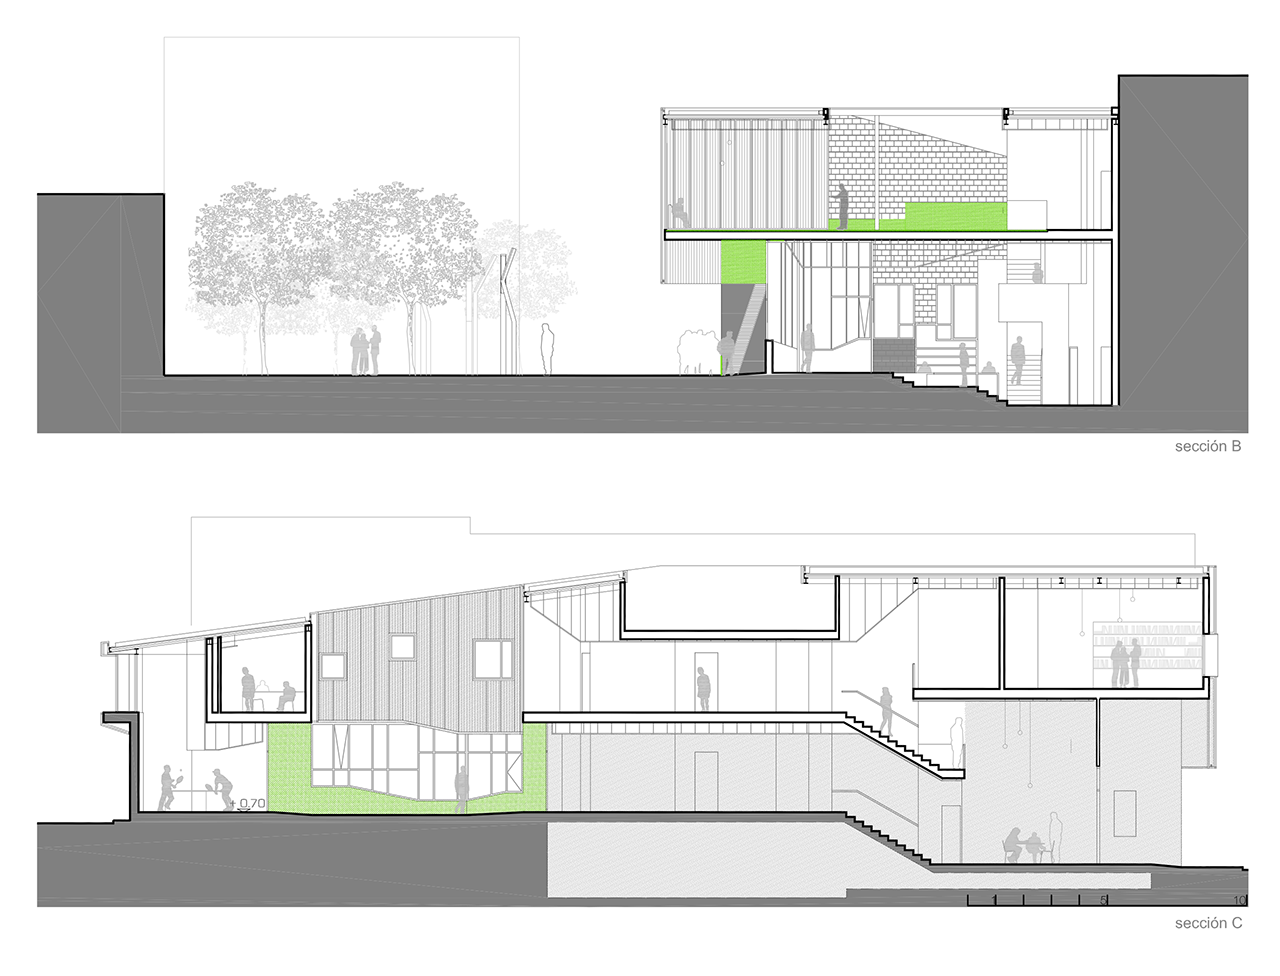 Centro juvenil casal de la juventud en novelda metalocus for Youth center architecture